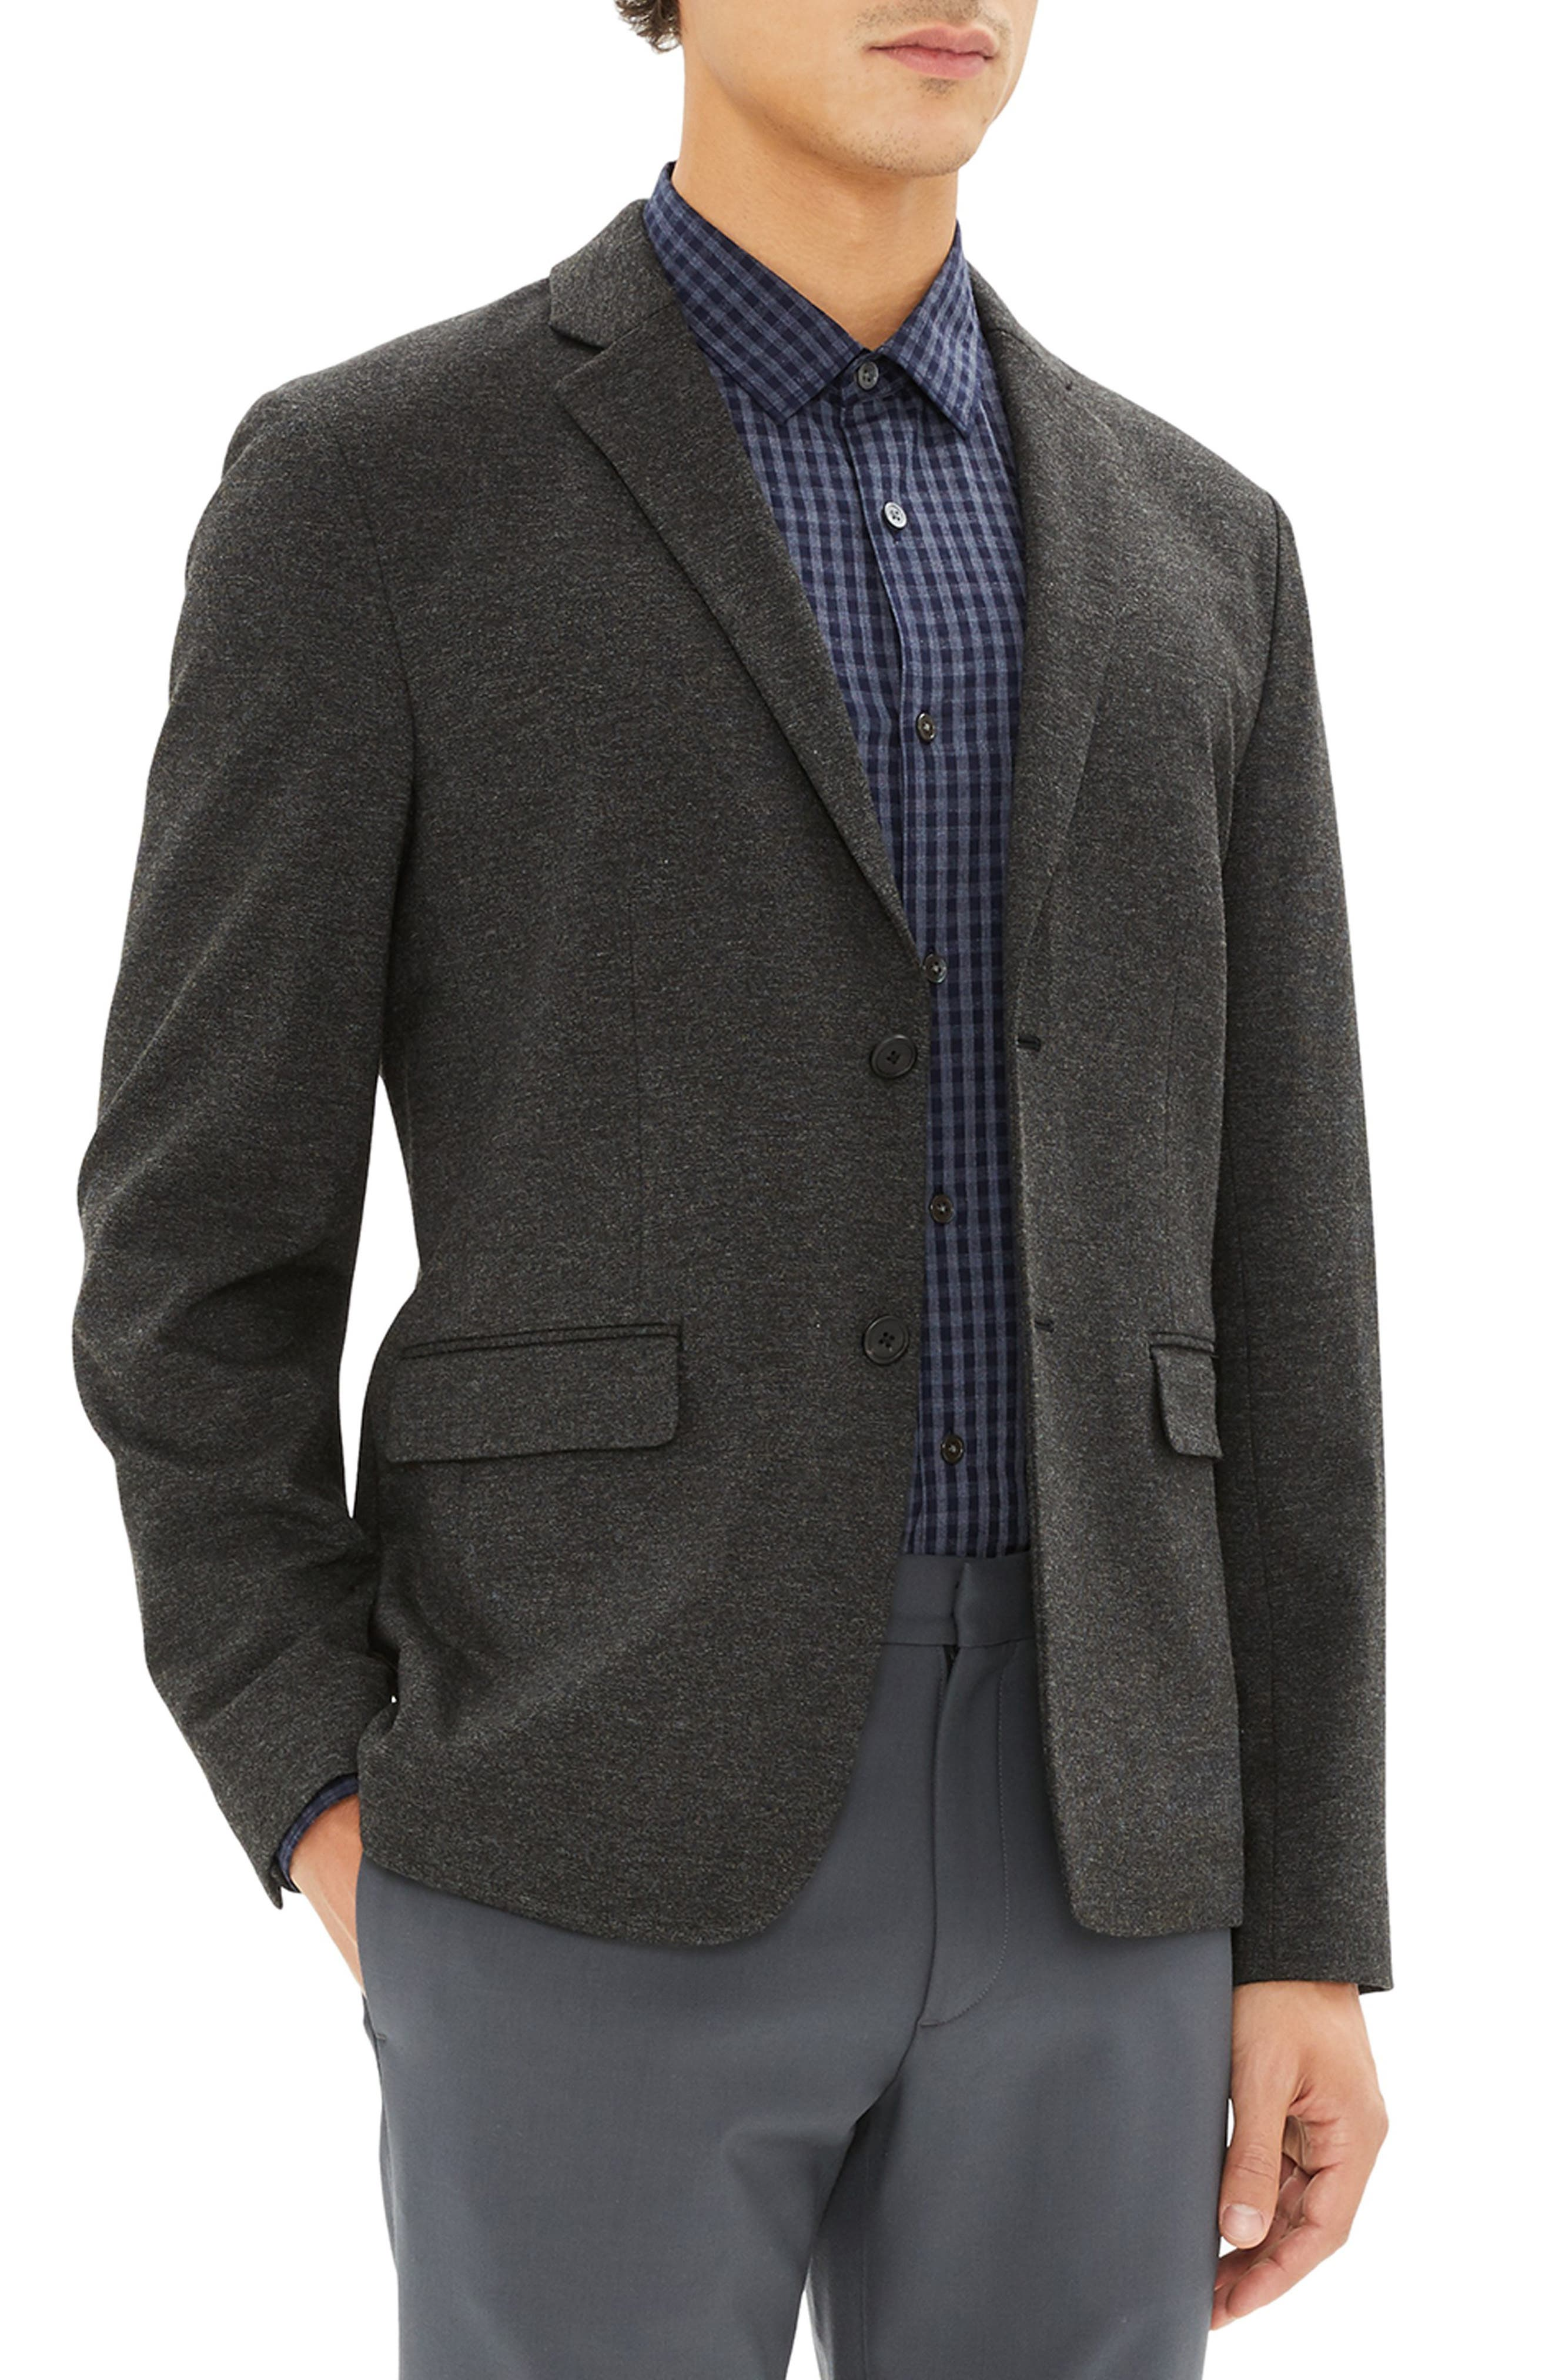 Clinton Marled Ponte Sport Coat,                             Alternate thumbnail 3, color,                             DARK CHARCOAL MELANGE